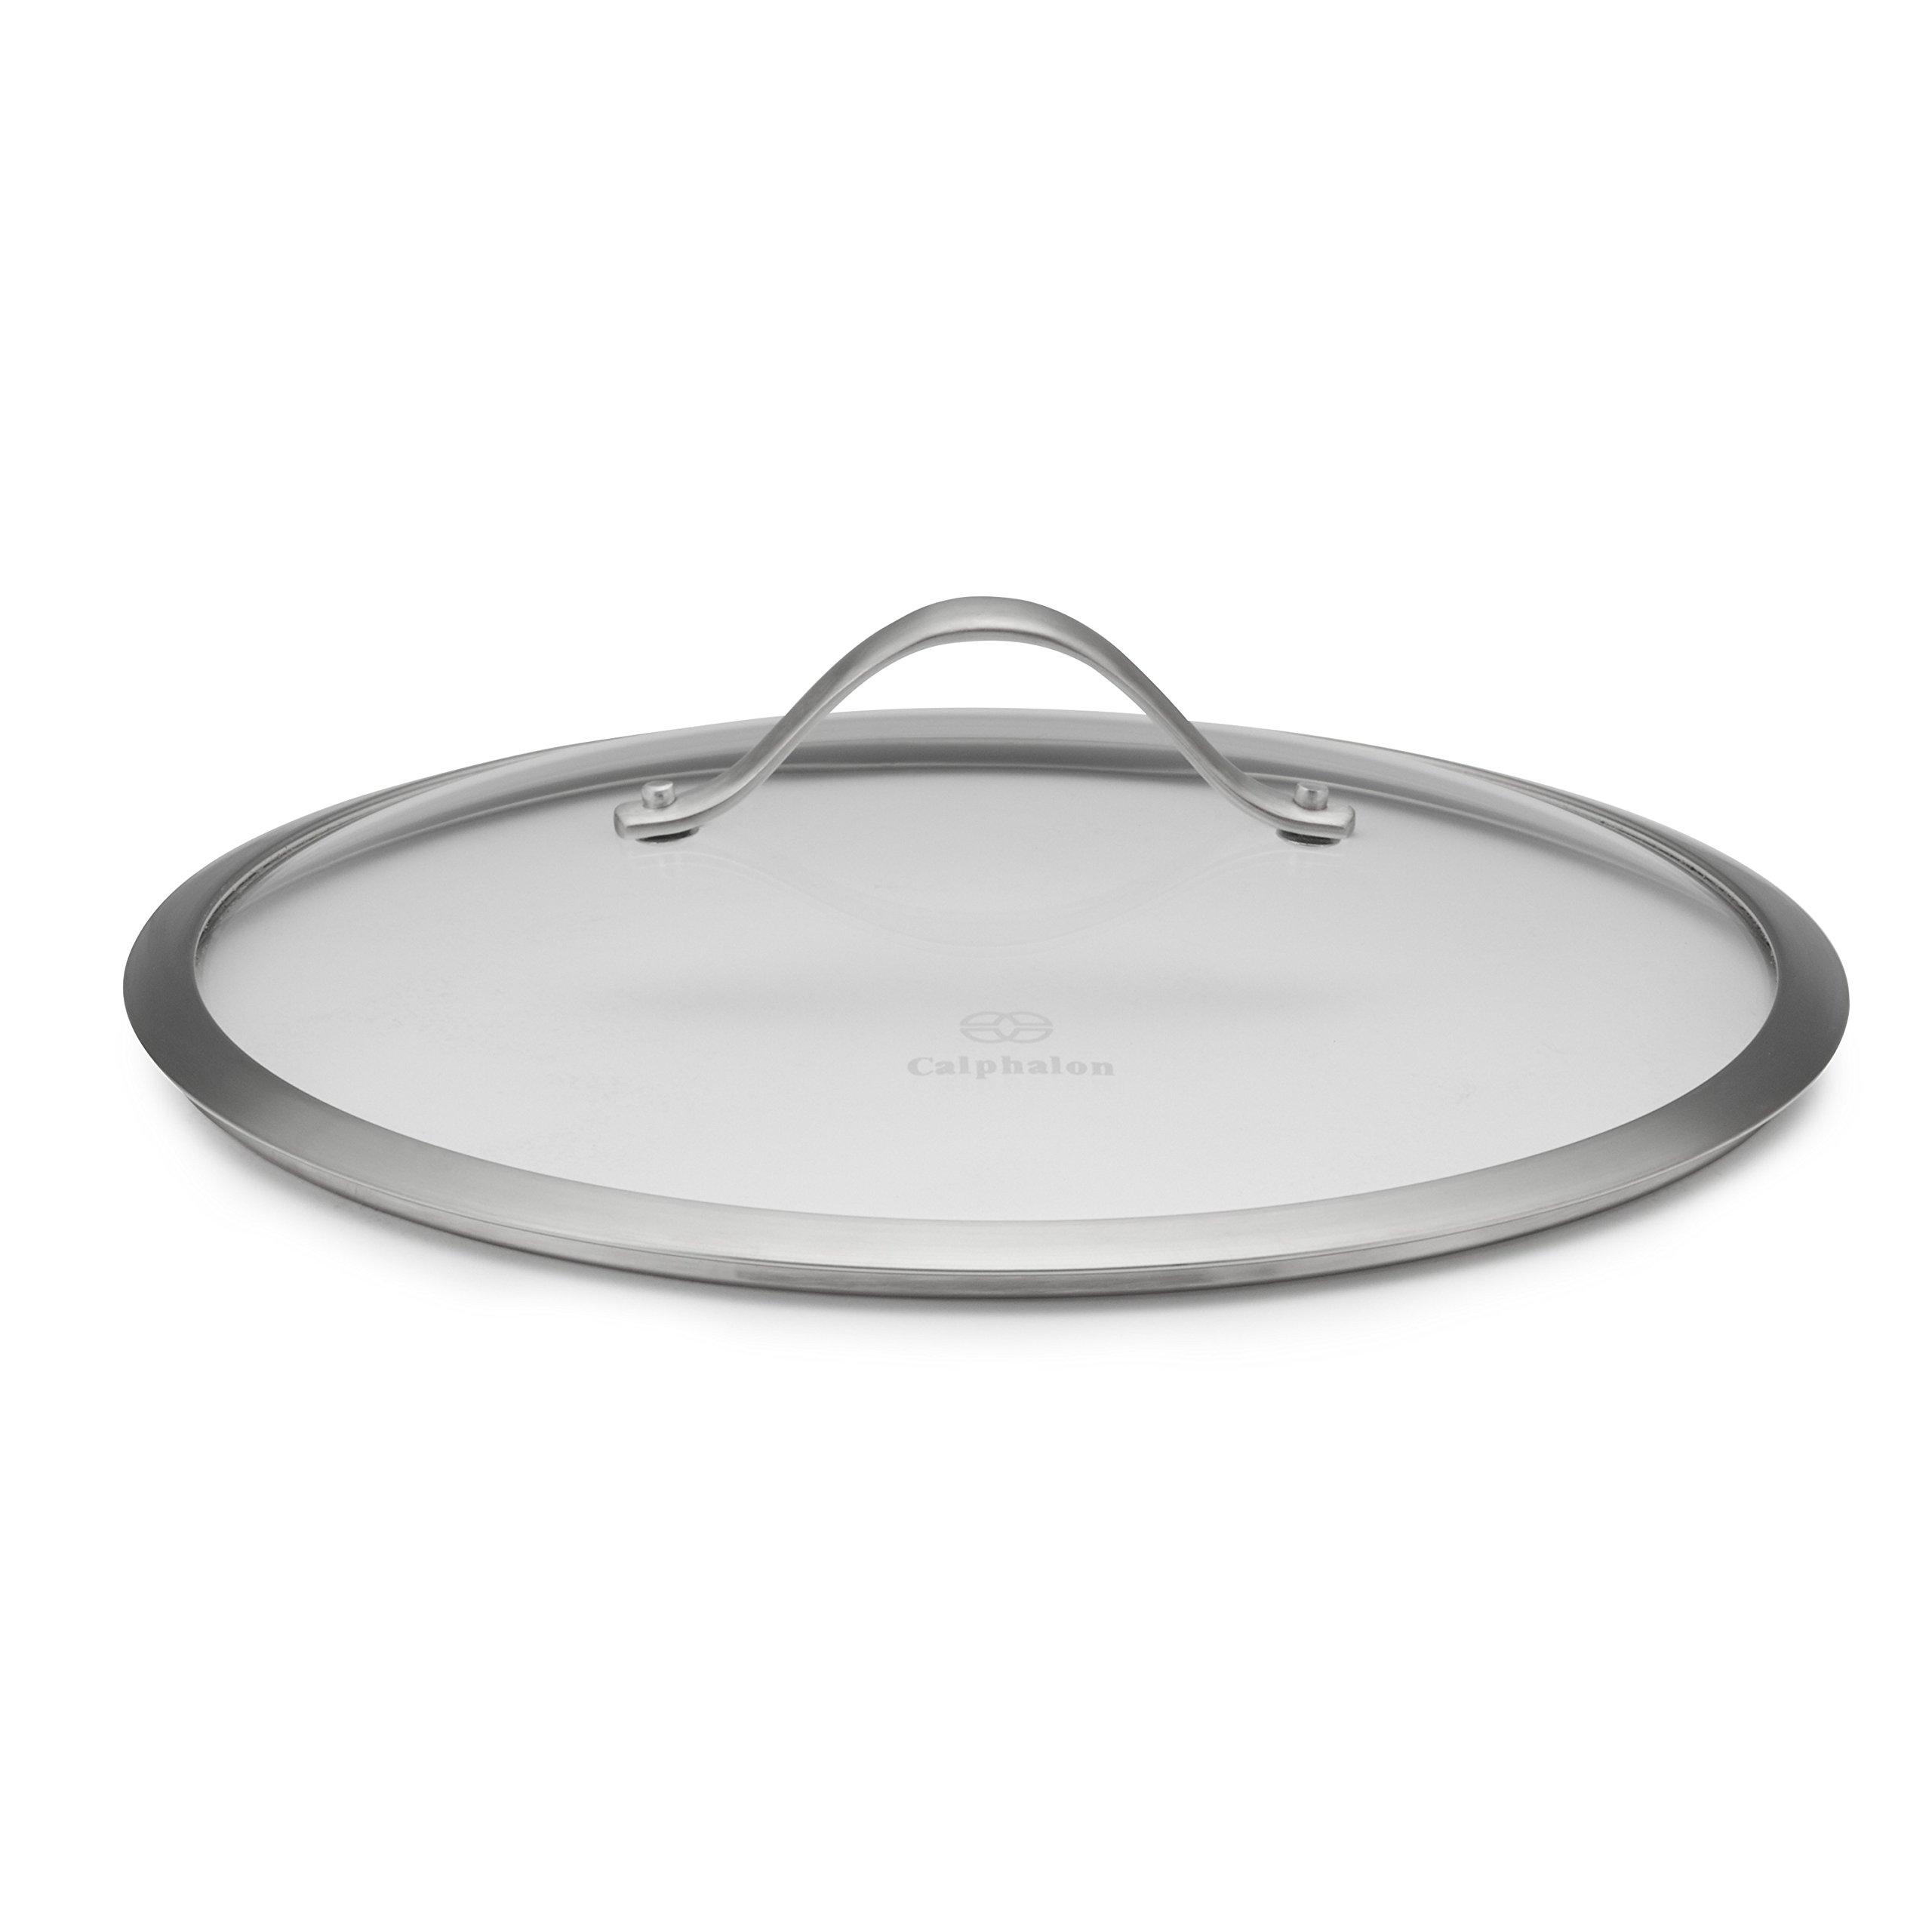 Calphalon Contemporary Hard-Anodized Aluminum Nonstick Cookware, Lid, 12-inch, Glass by Calphalon